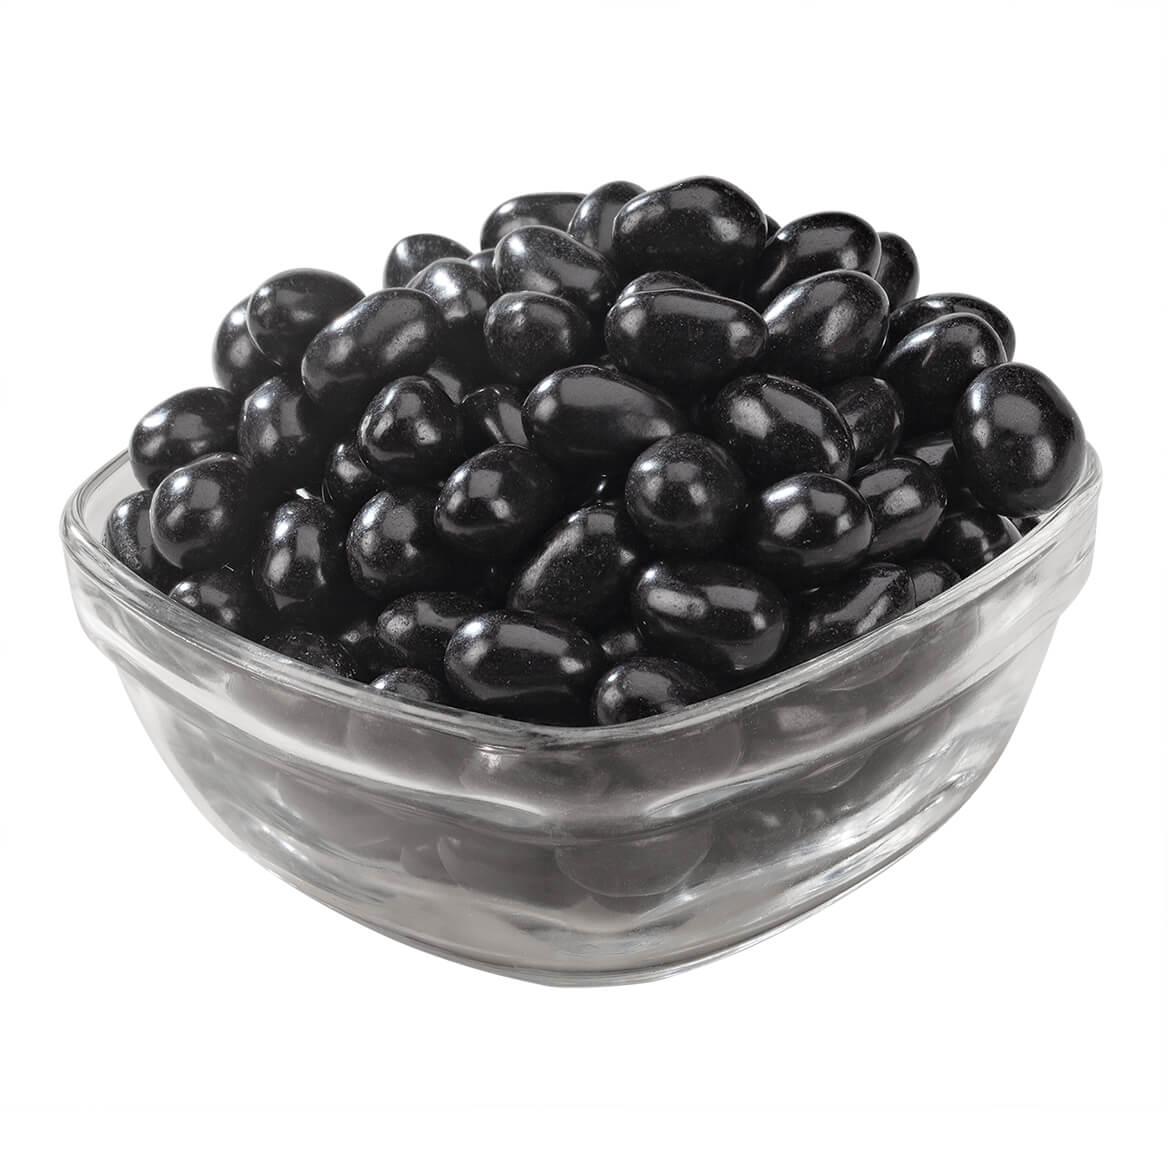 Black Licorice Jelly Beans, 22 oz.-363460